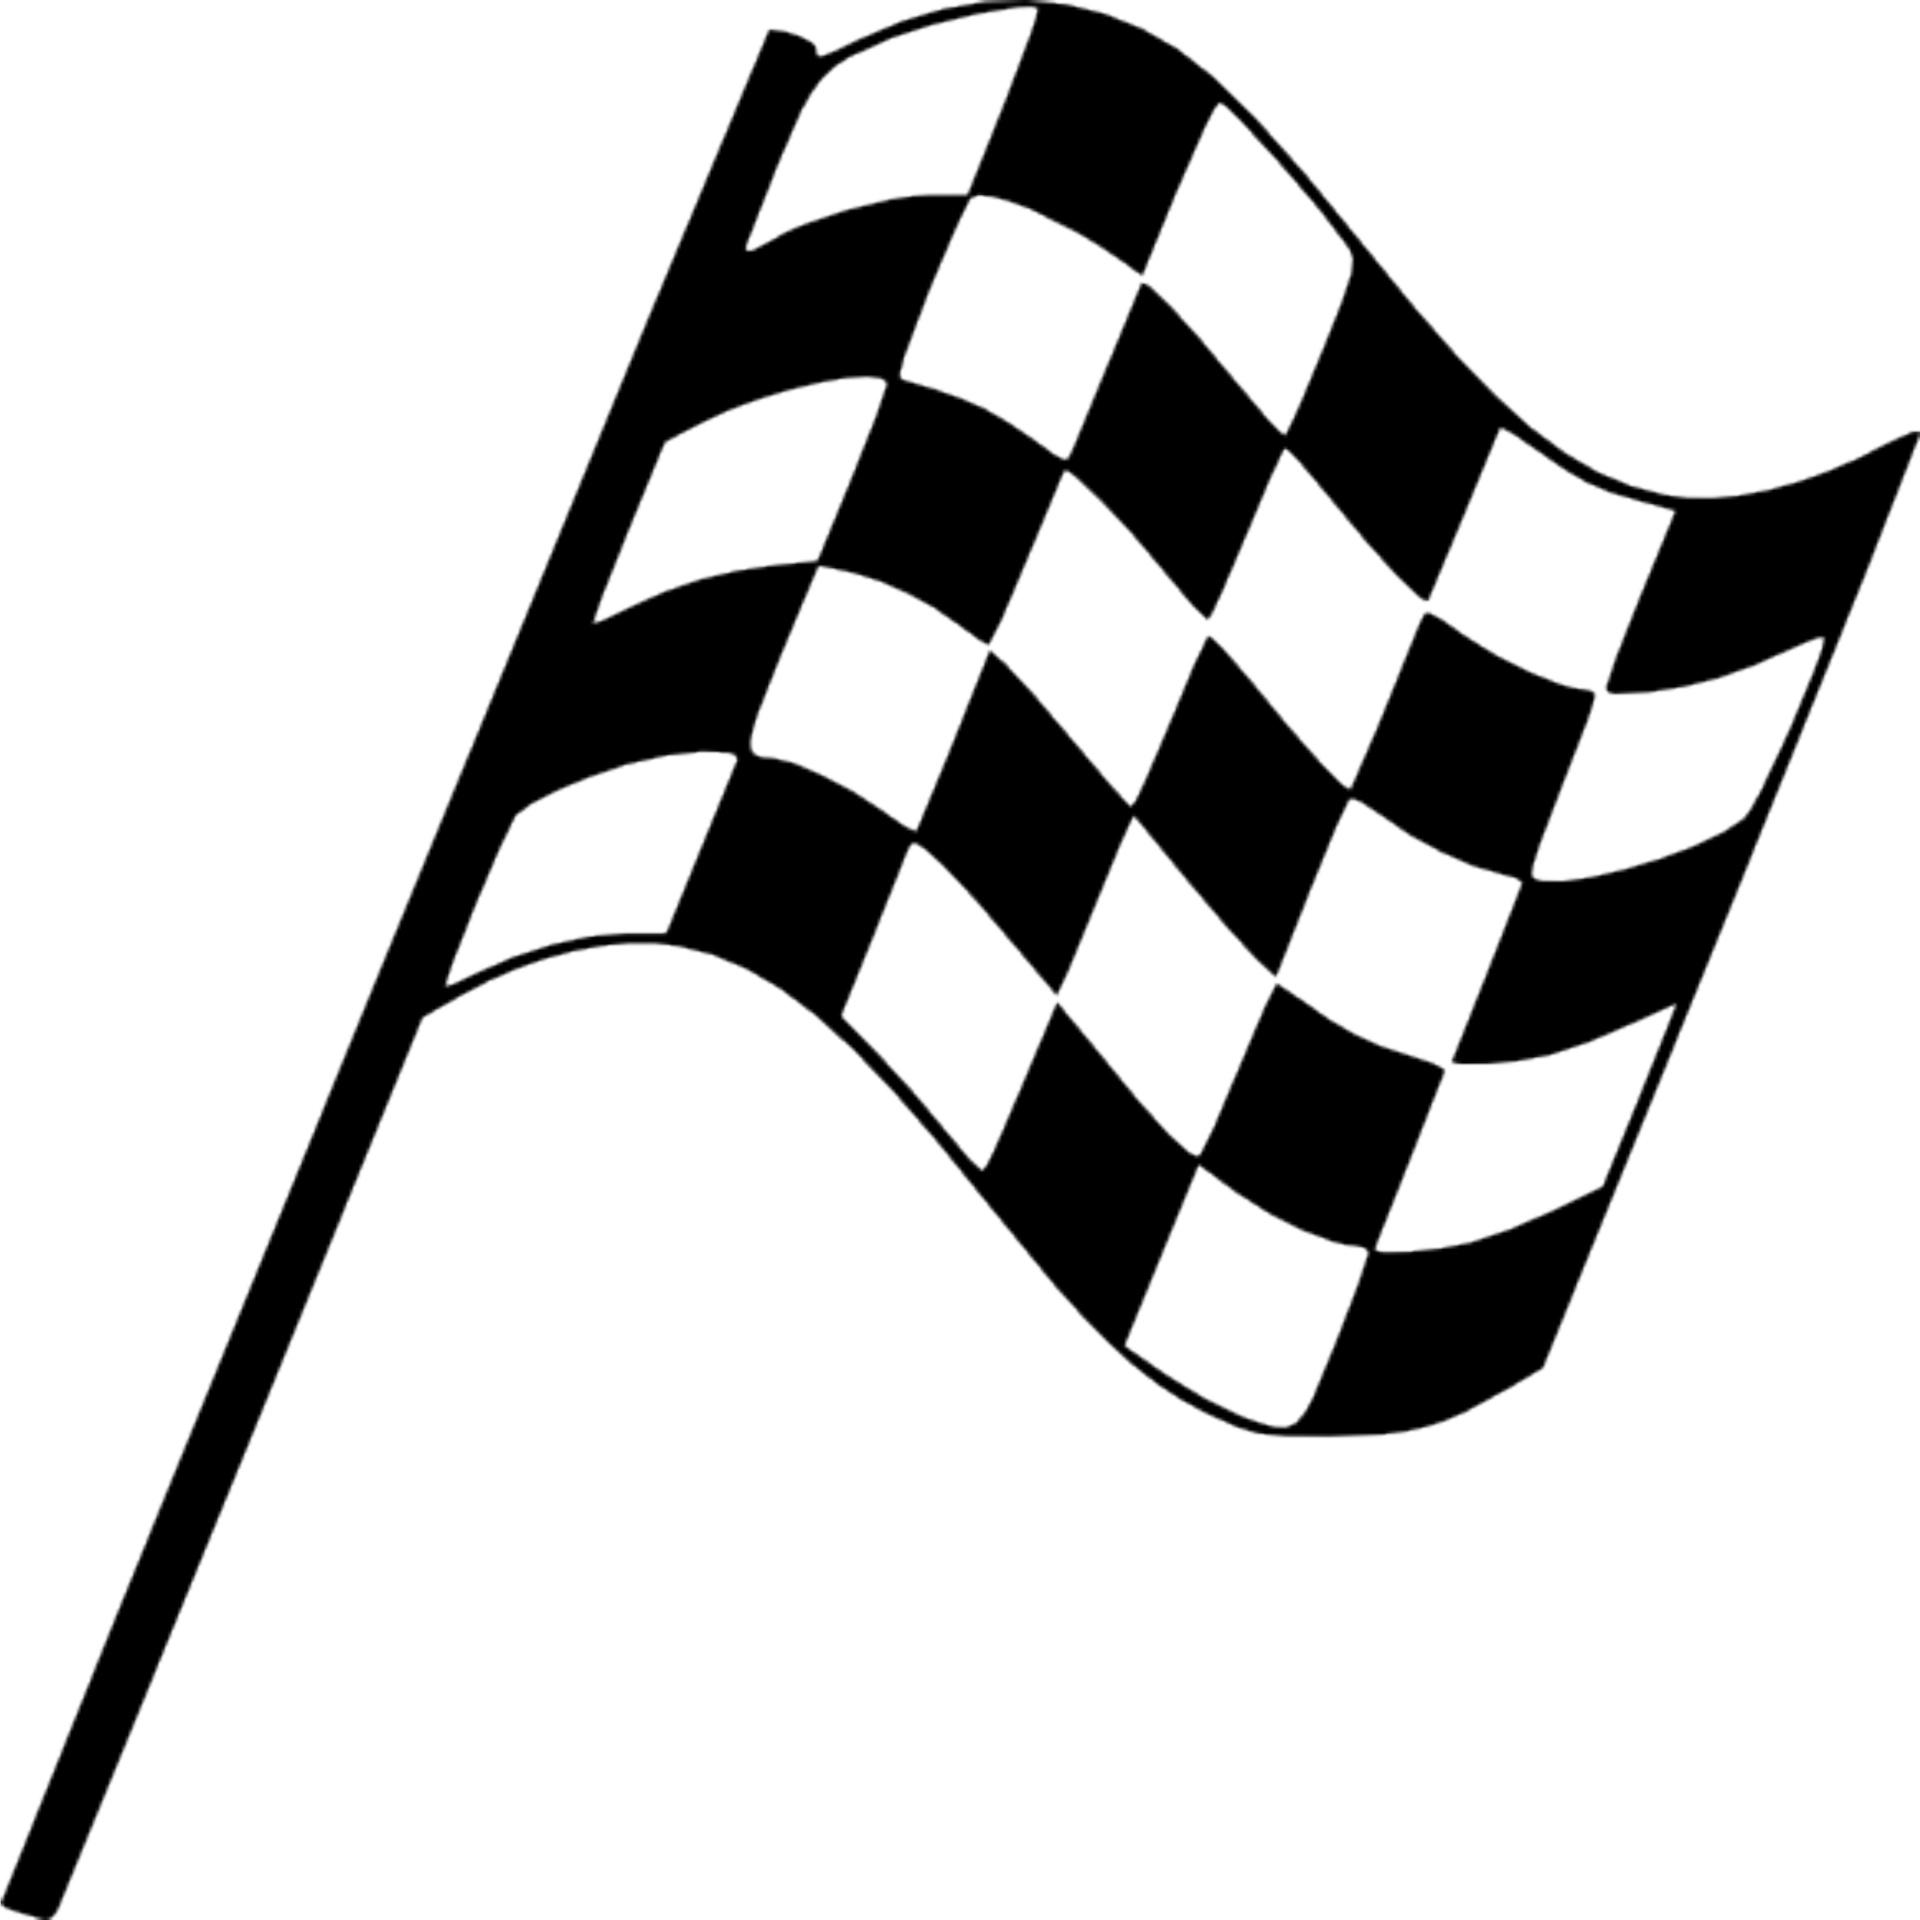 1920x1920 Race Car Clipart Start Line